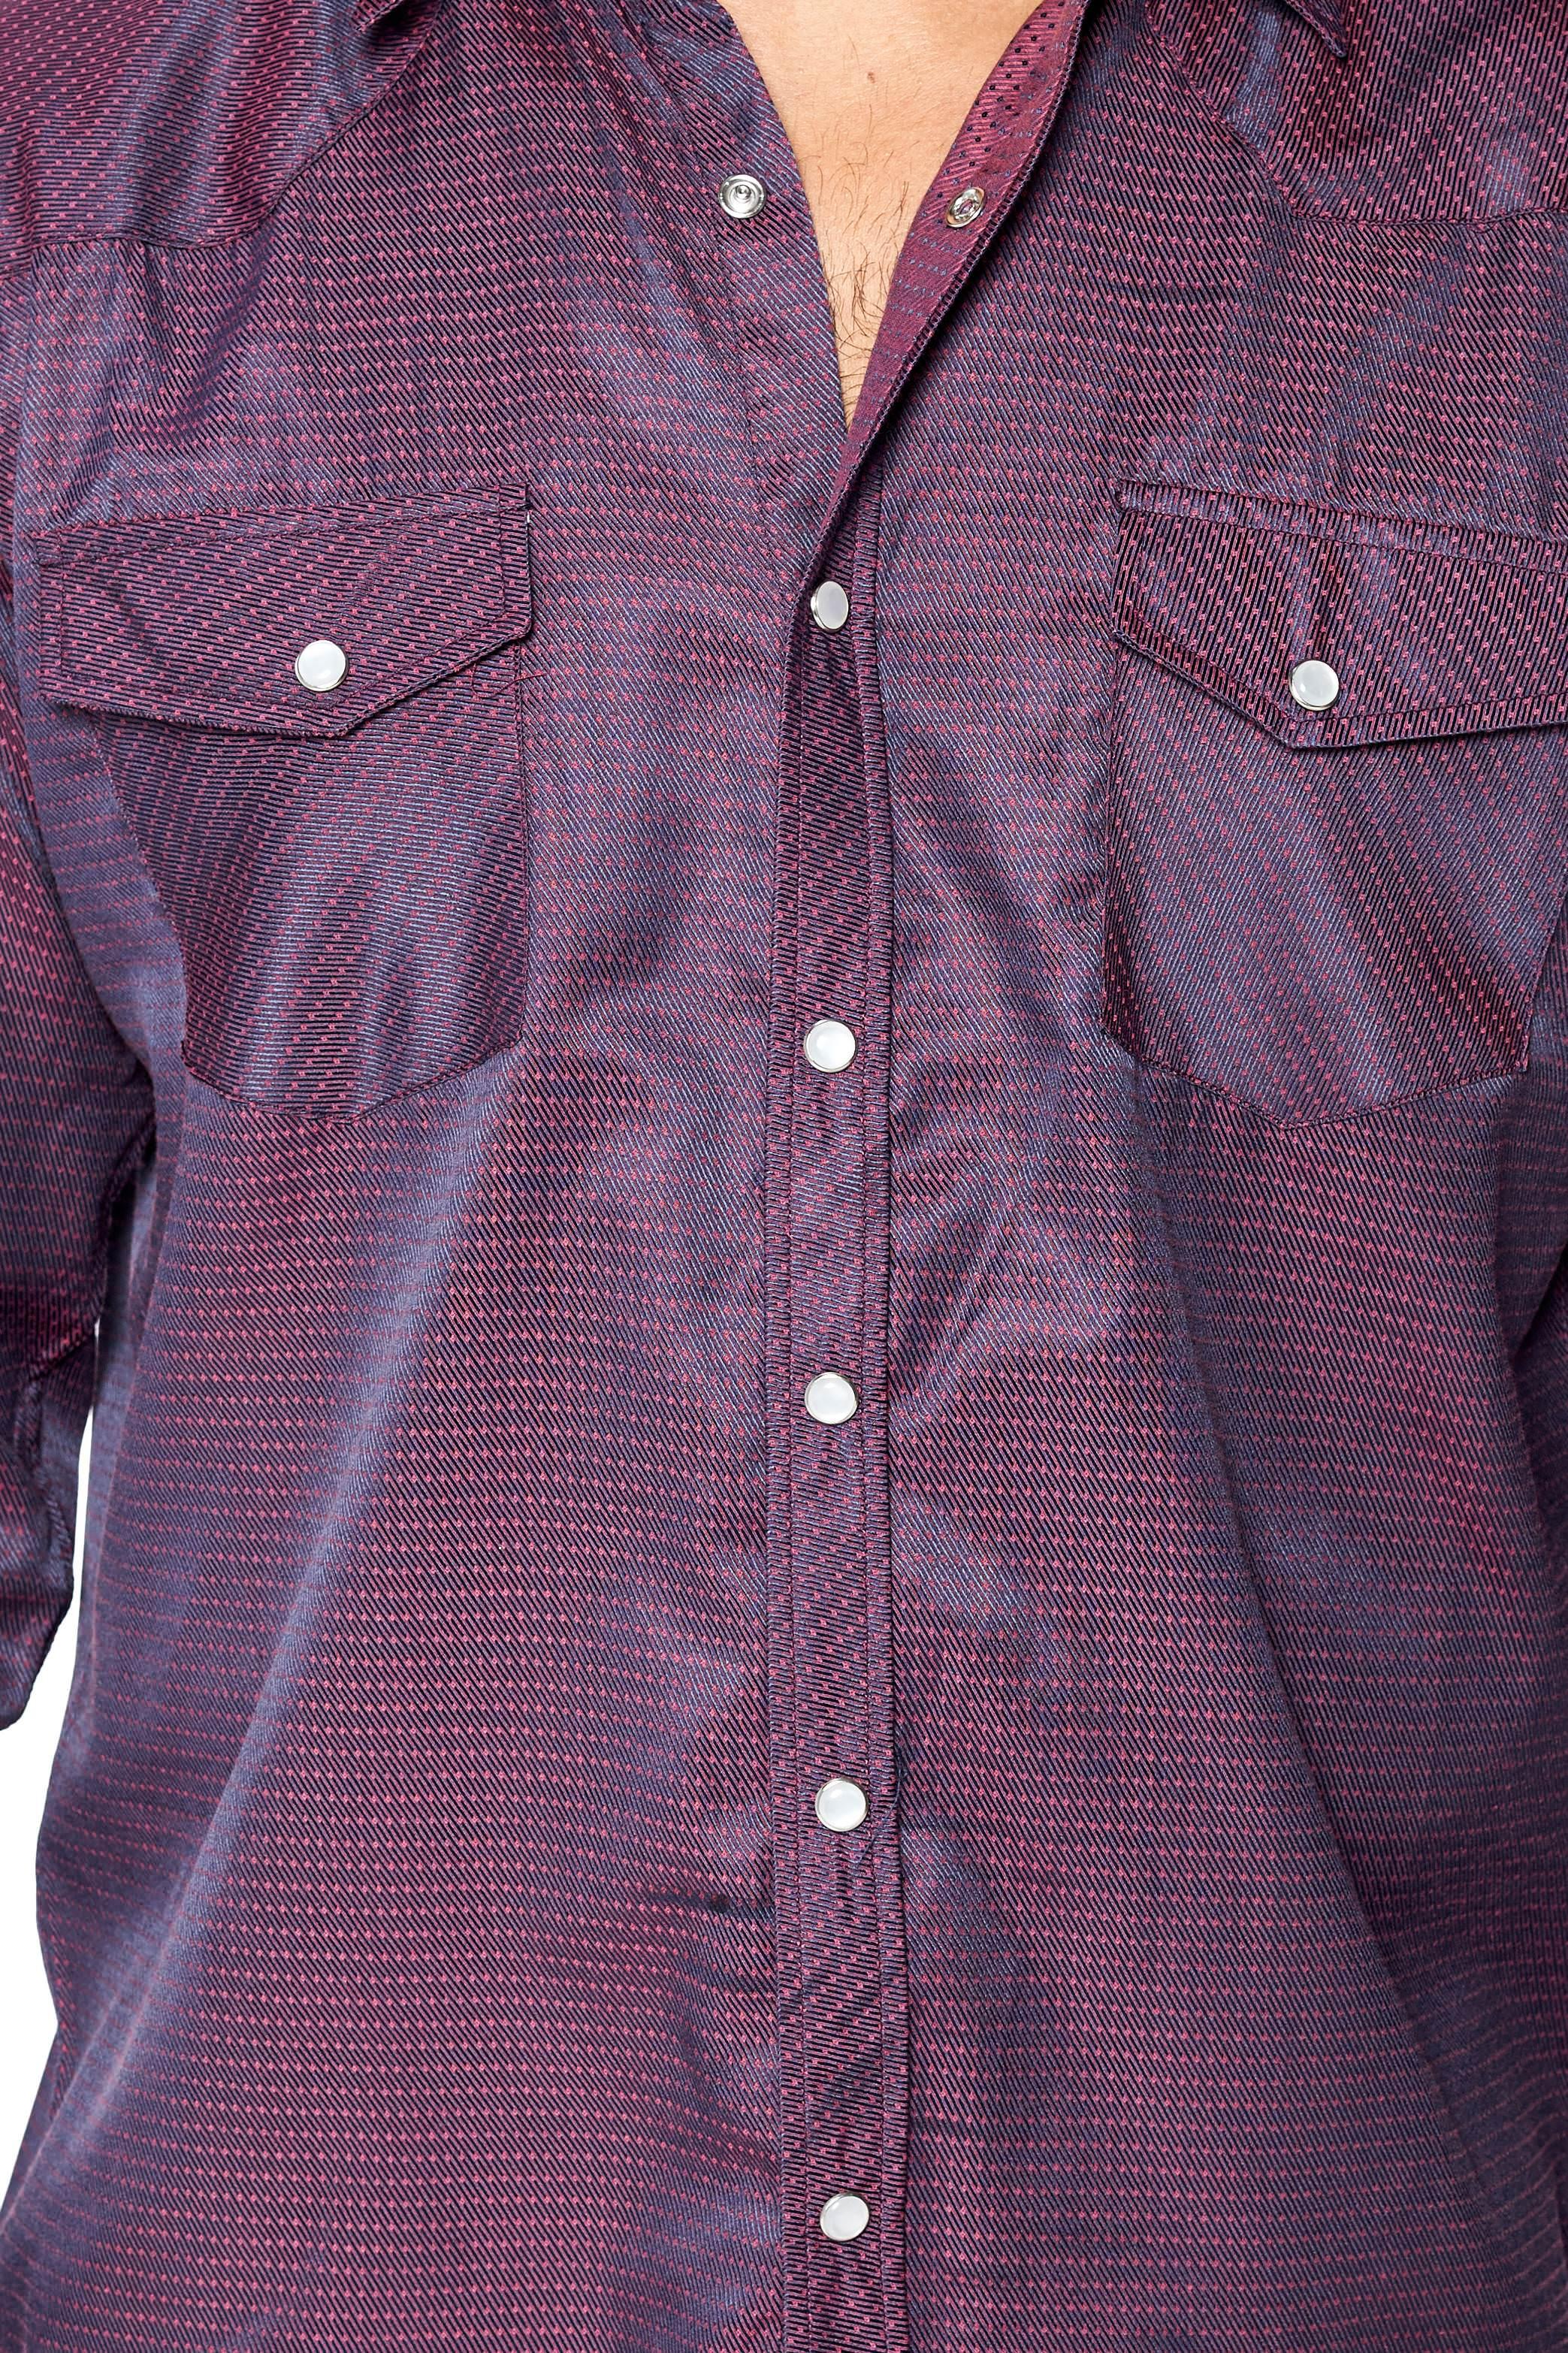 LW-Men-039-s-Pearl-Snap-Tribal-Stylish-Printed-Woven-Western-Vaquero-Rodeo-Shirt thumbnail 34